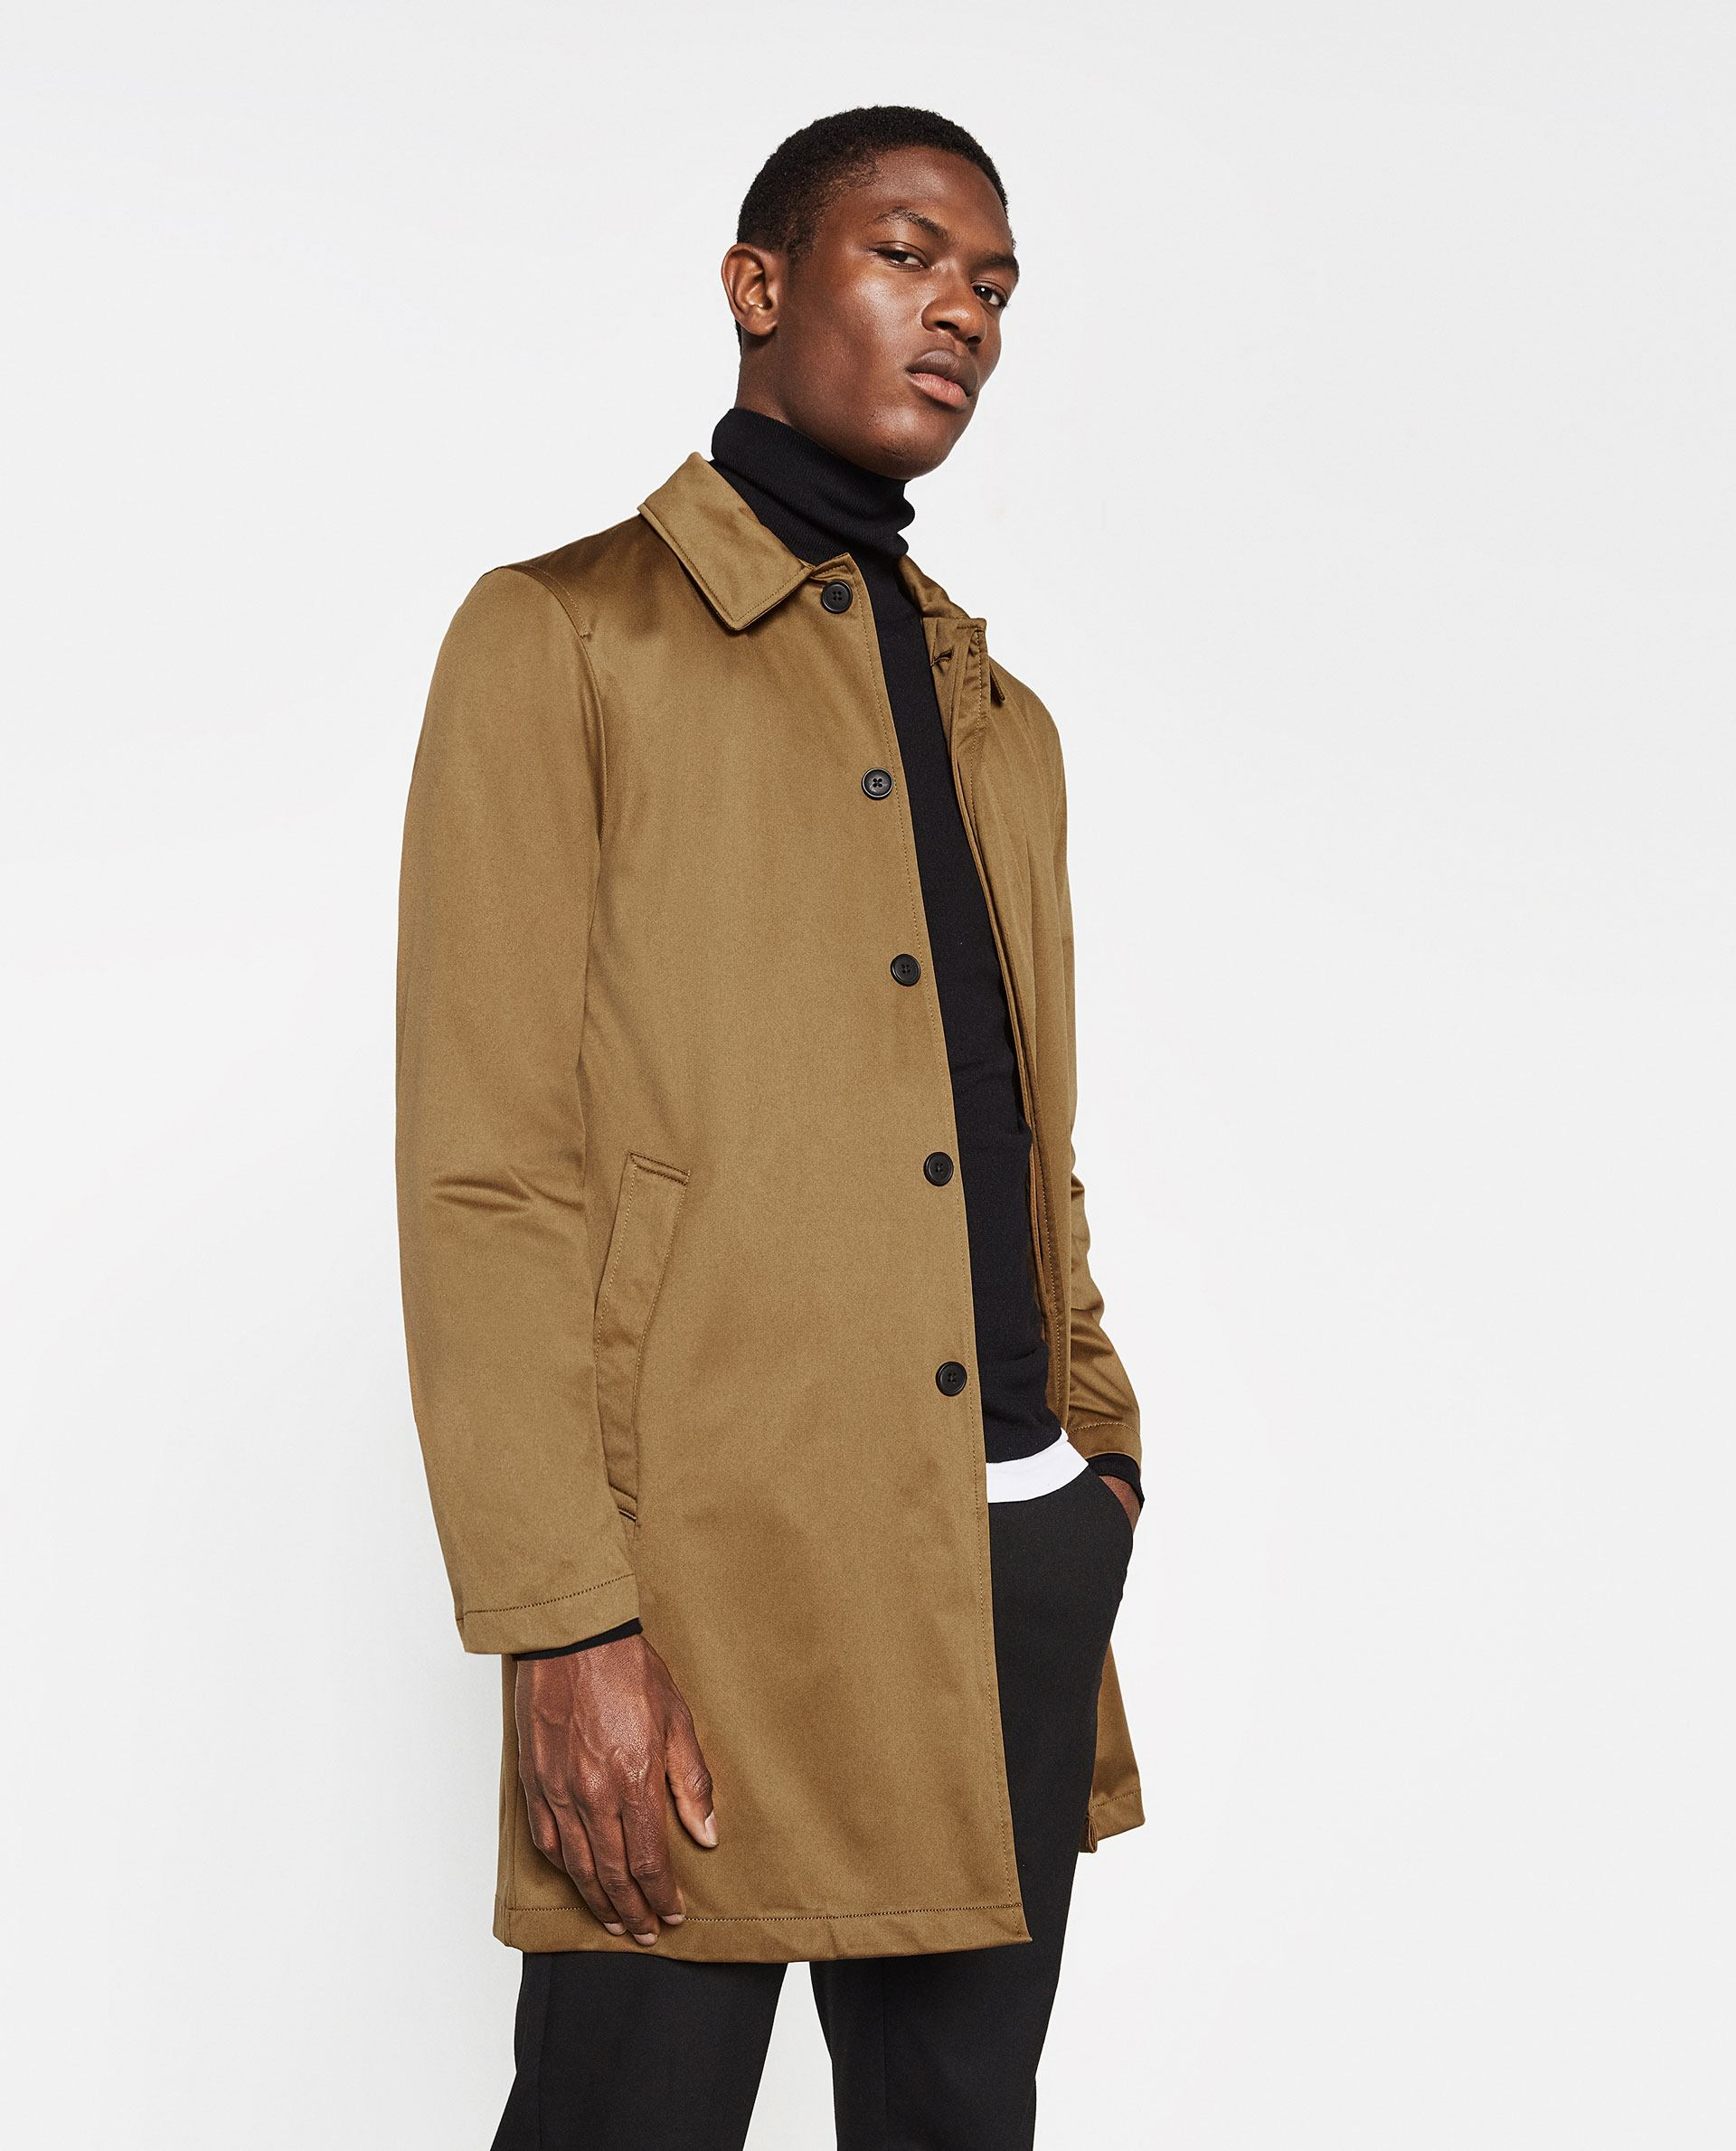 Moda hombre tendencias en ropa para hombre oto o invierno - Tendencias en ropa ...